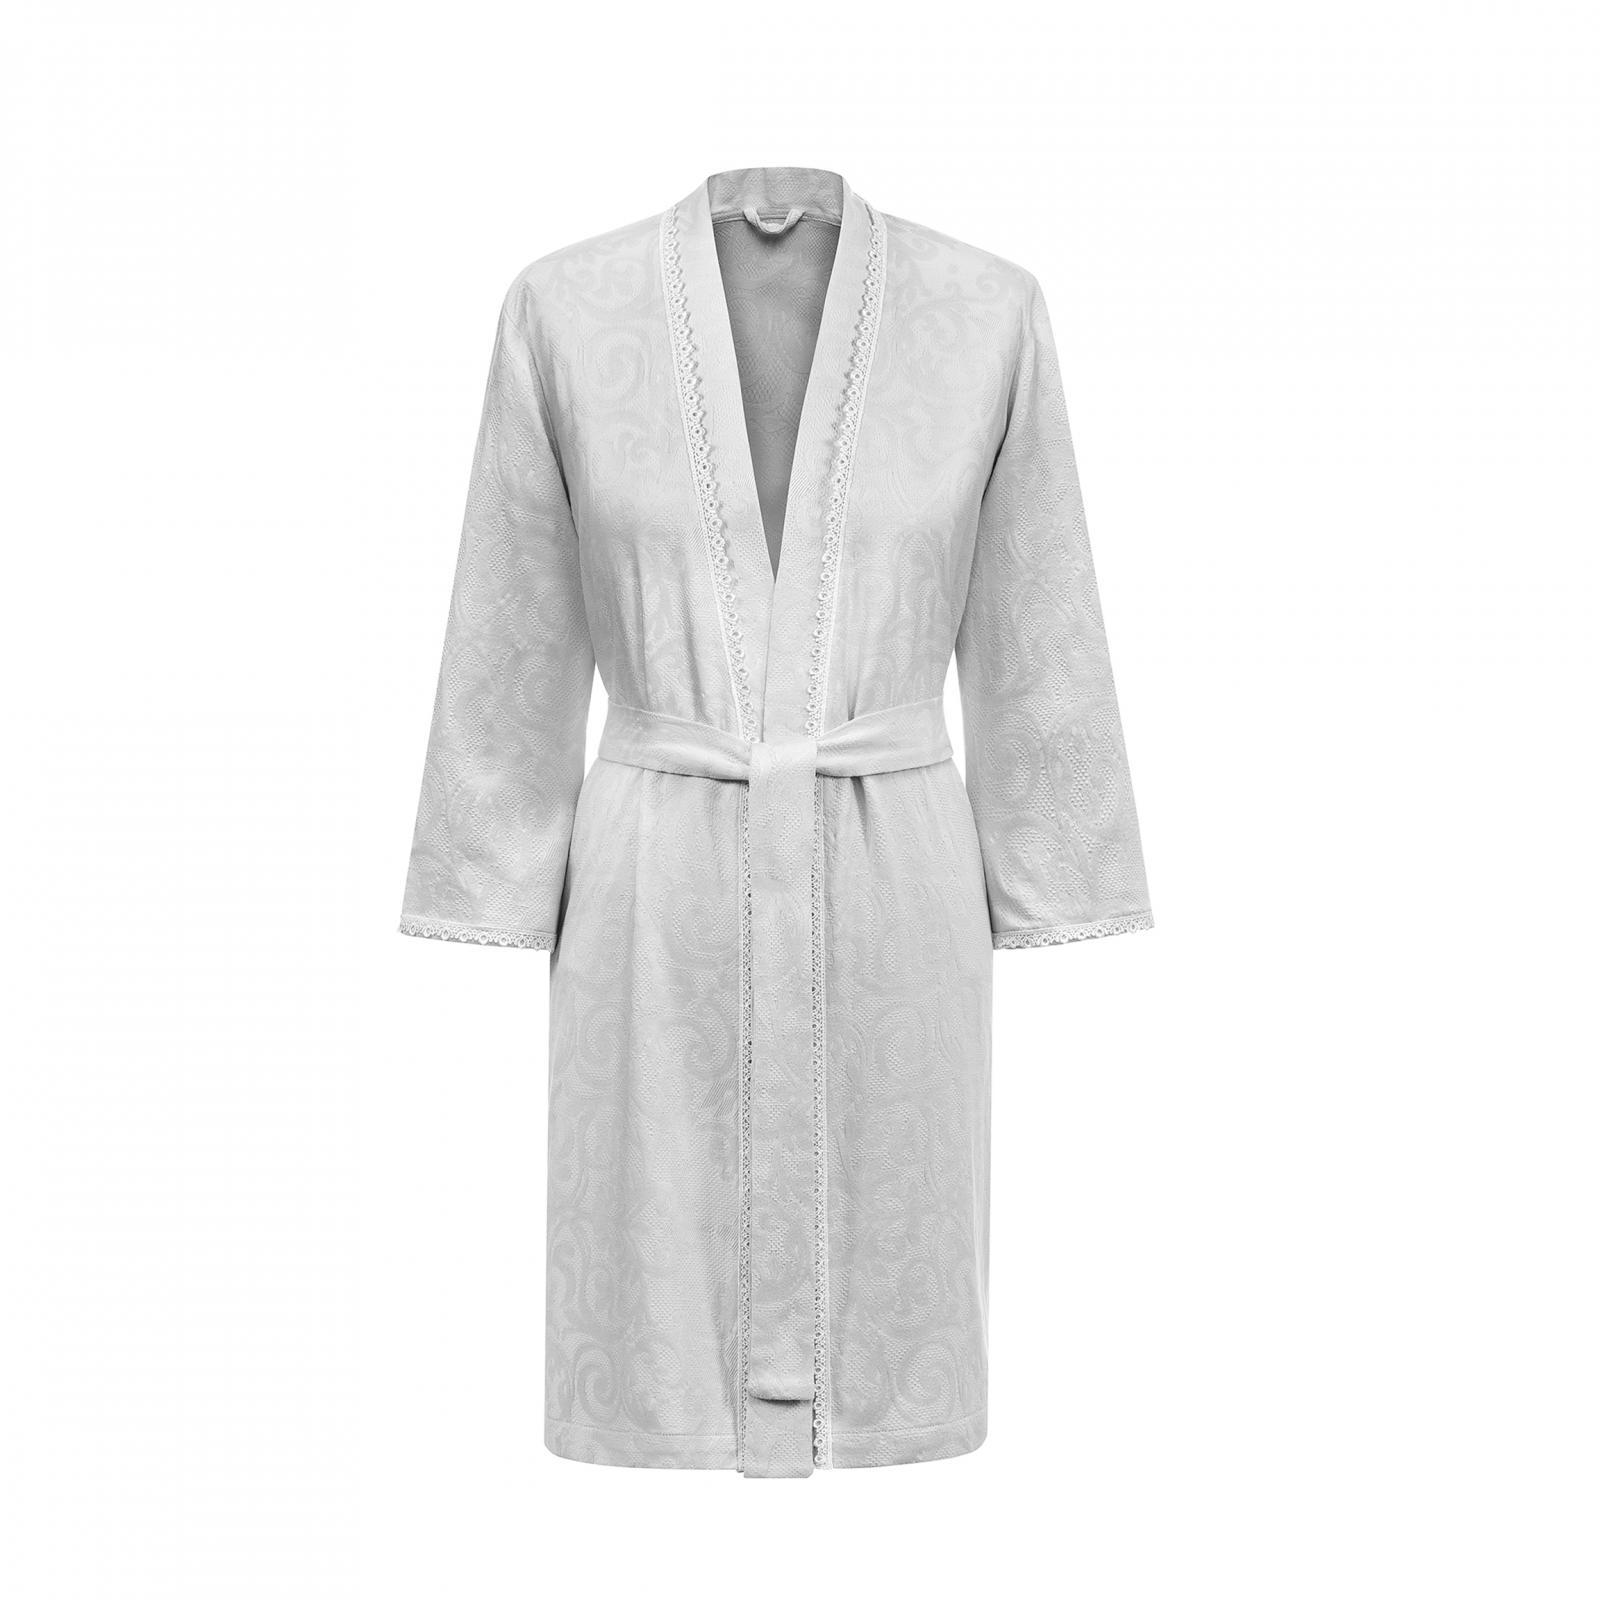 Фото - Халат Togas Дорис серый м /46/ коврик для ванной togas дорис розовое 60x90